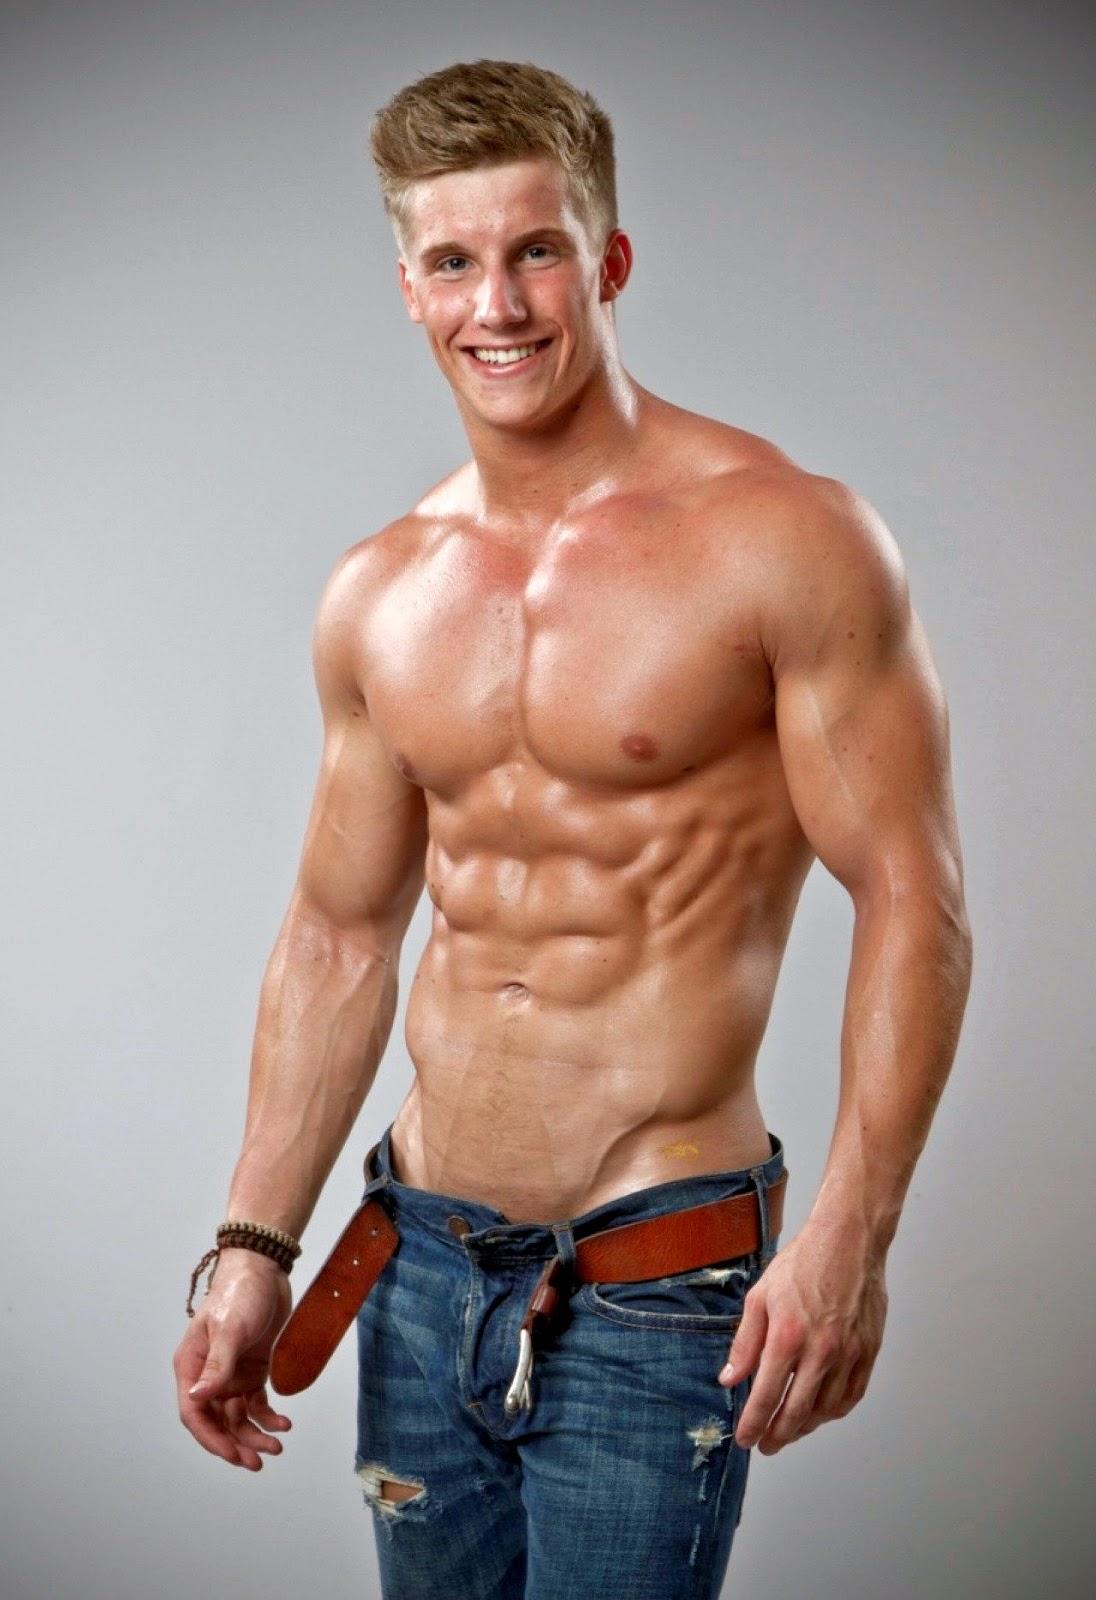 Body builder nude pics 144